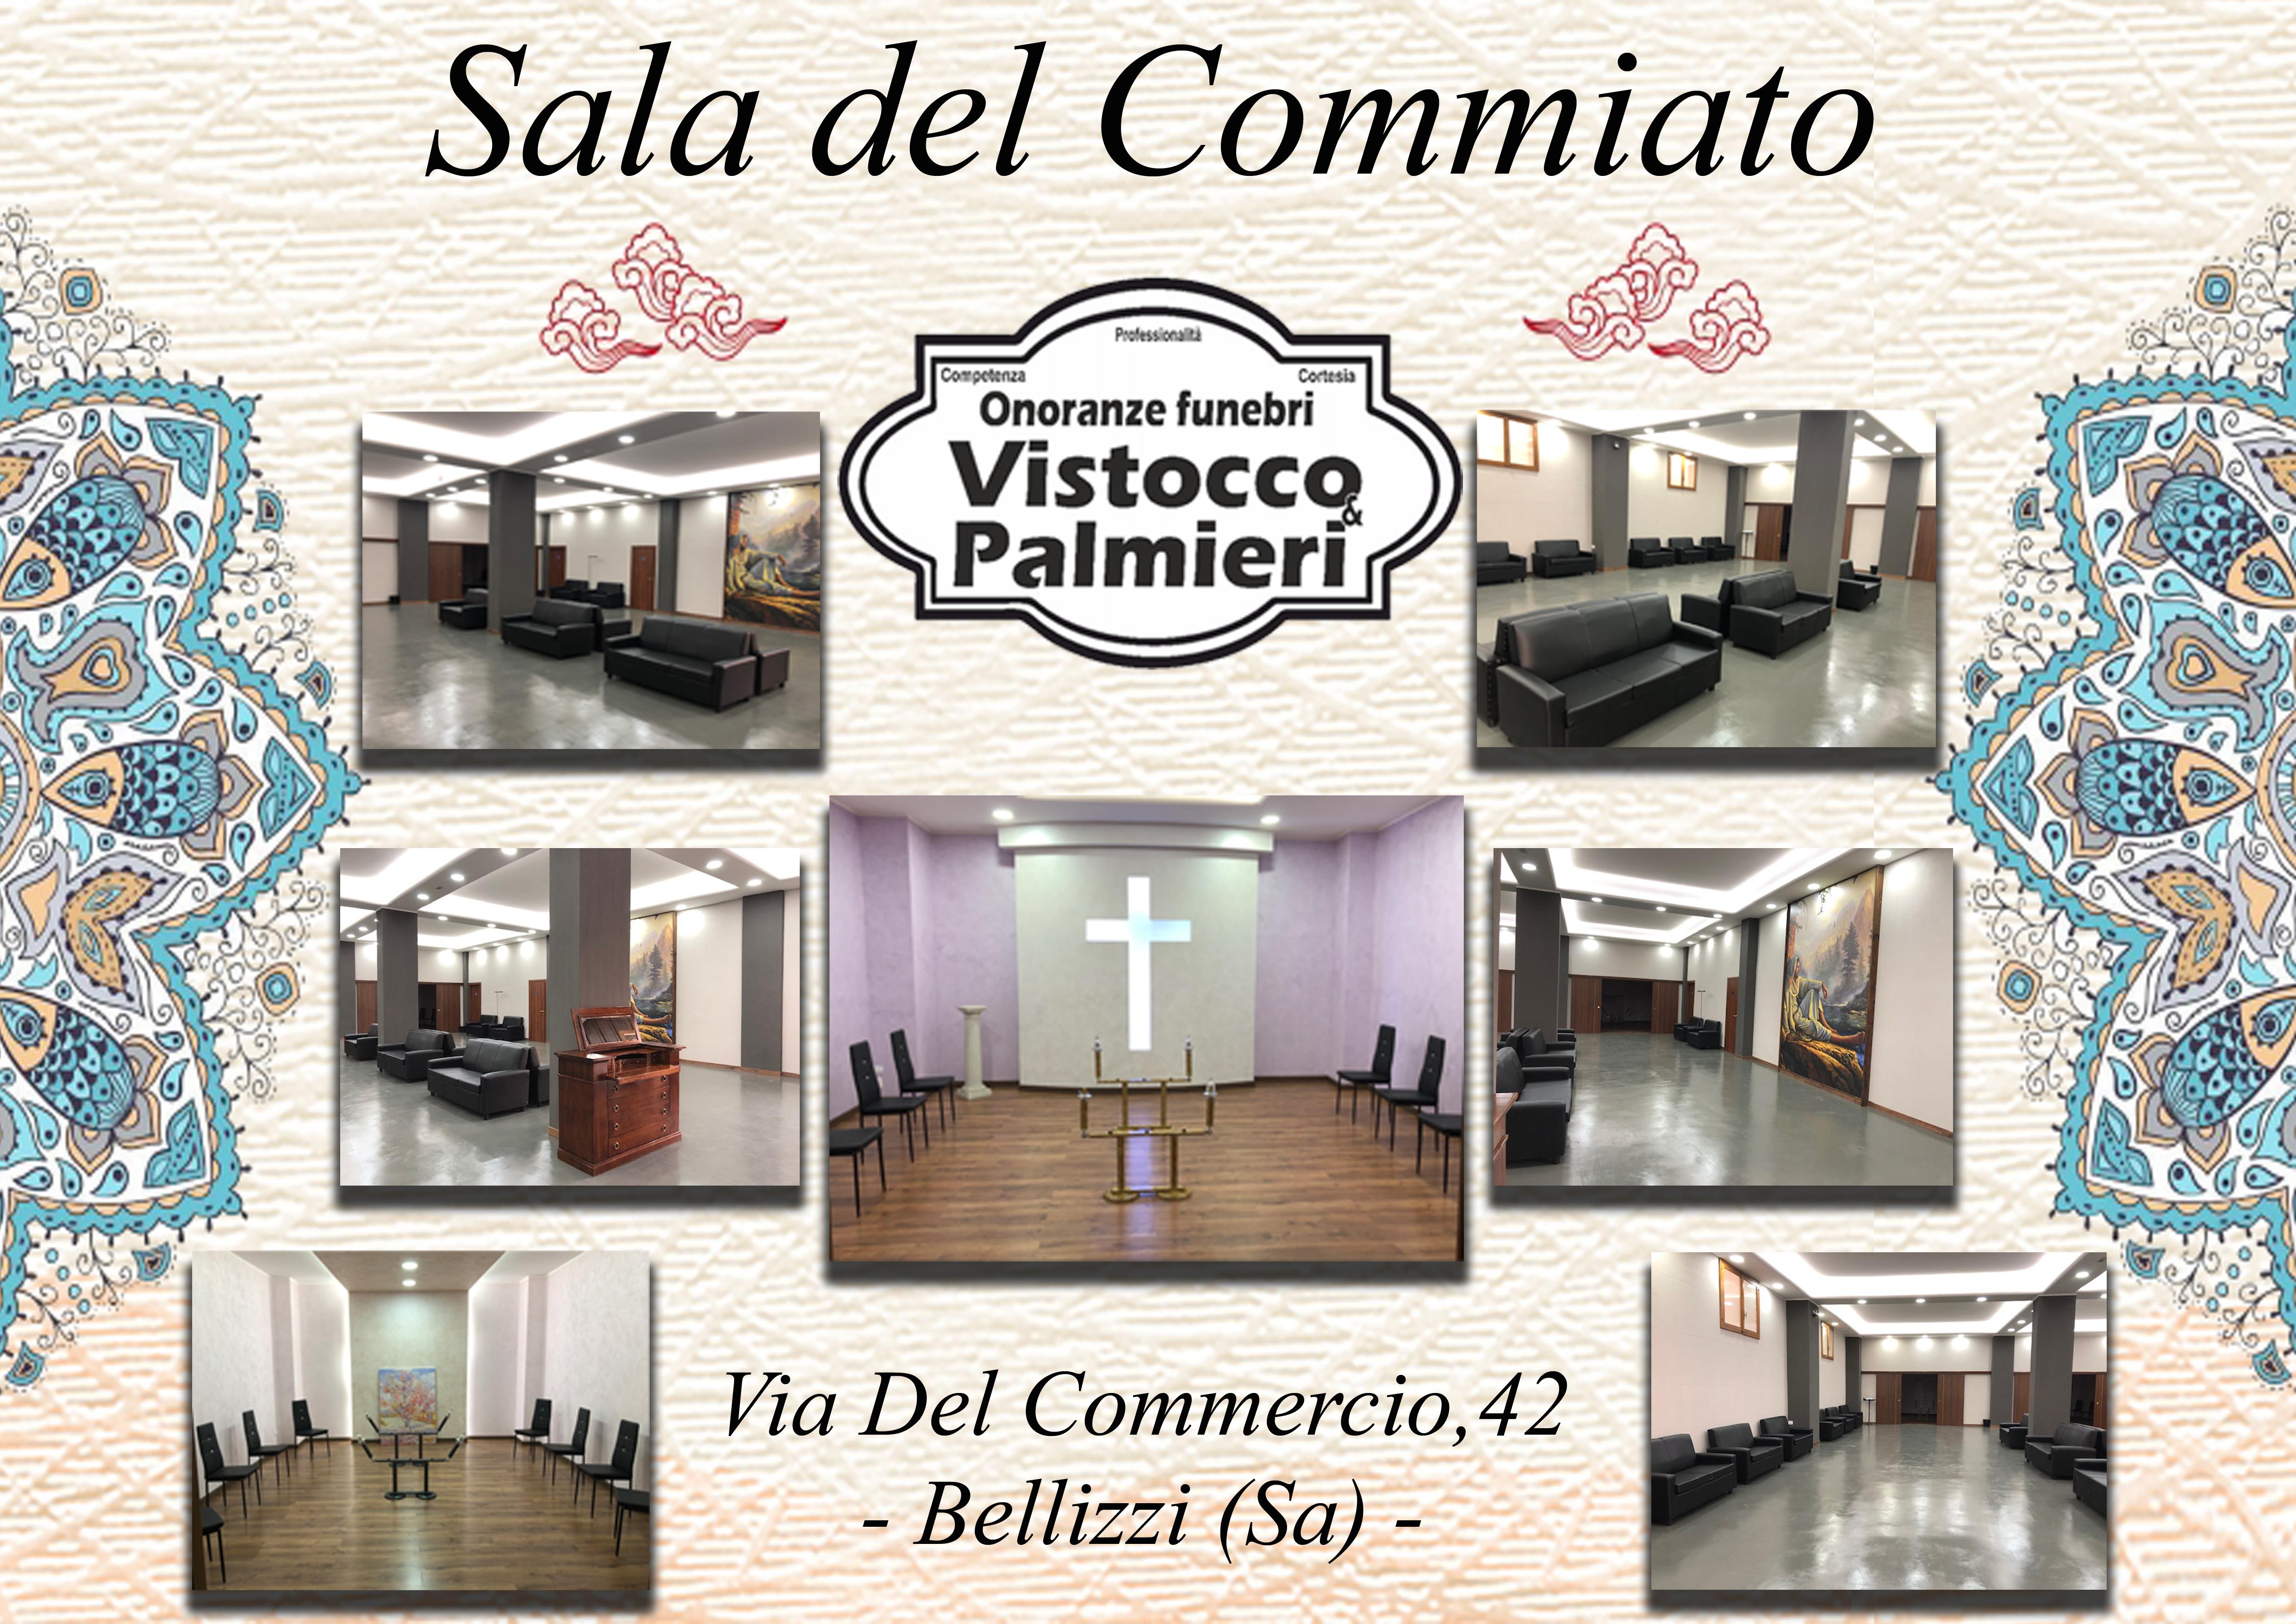 http://www.funeralservicesrl.it/wp-content/uploads/2020/01/Sala-del-commiato-1.jpg